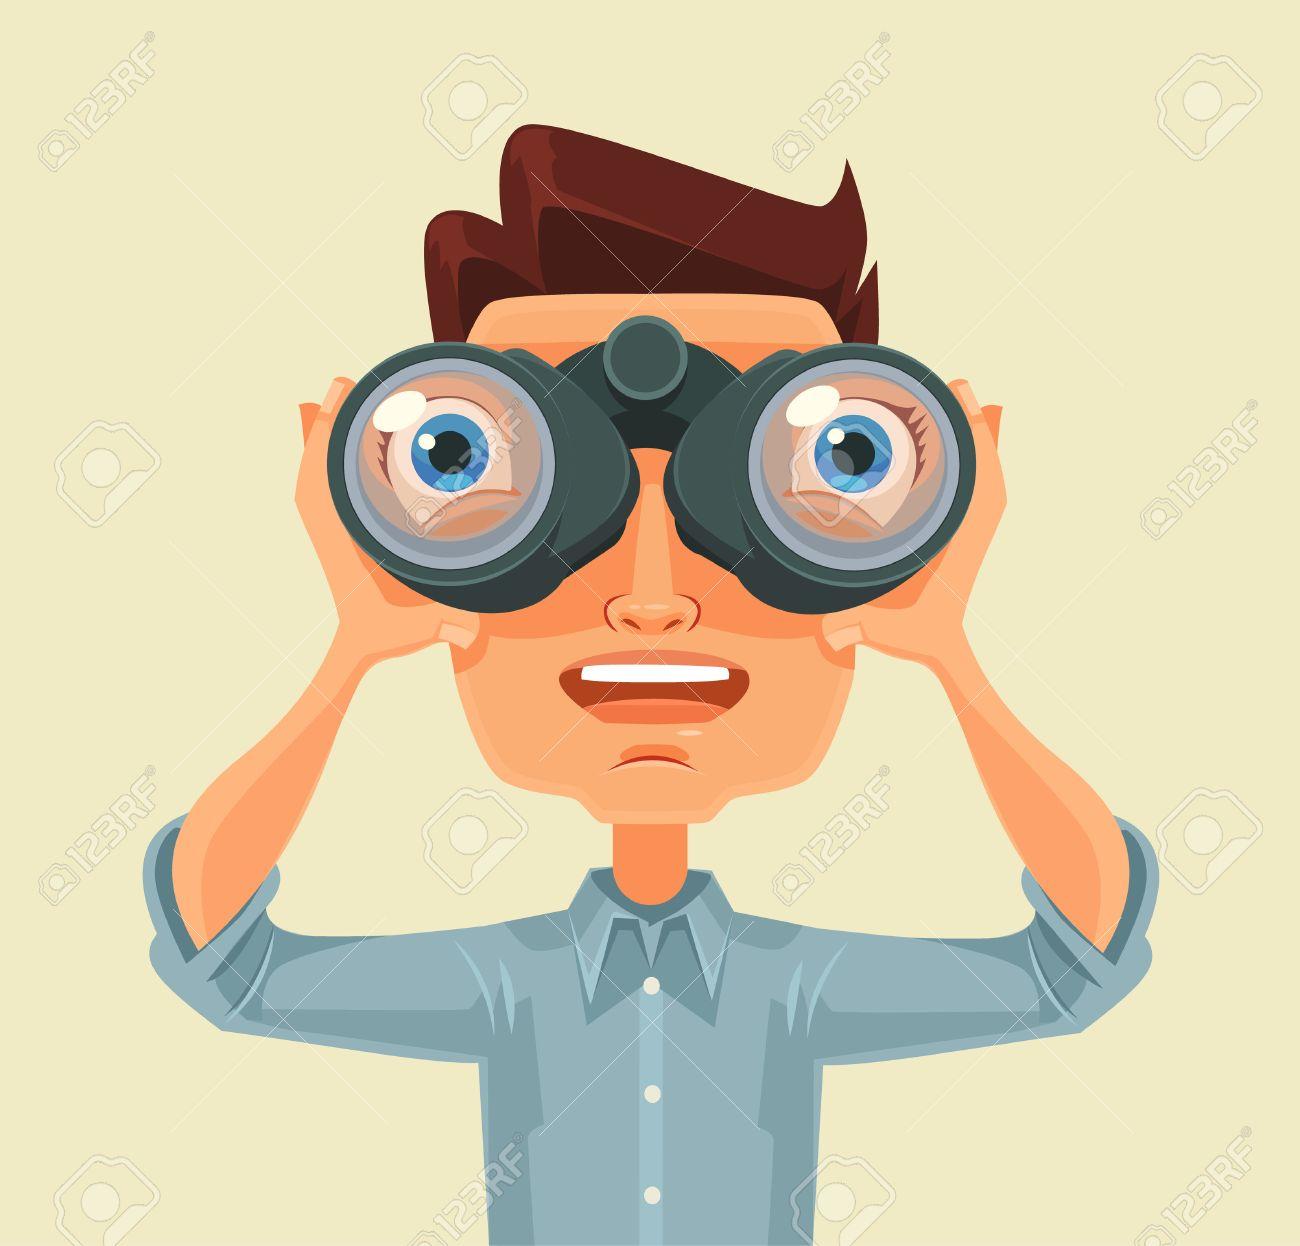 Man with binoculars. Vector flat cartoon illustration - 55543075